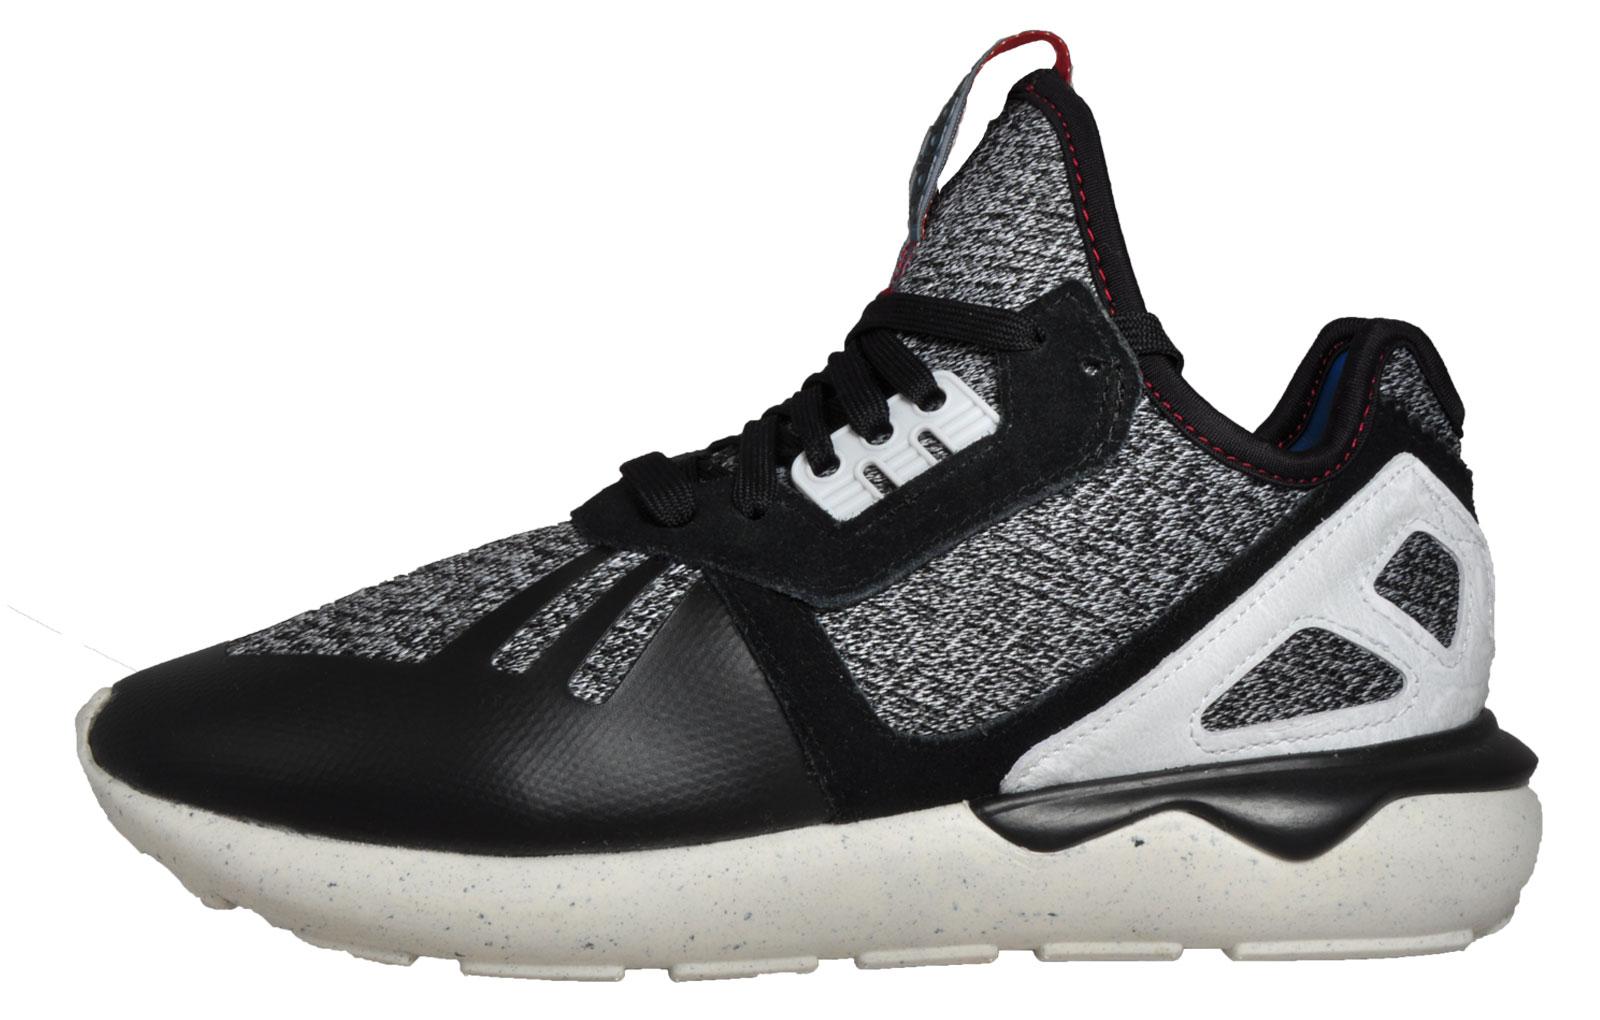 70edd3bfad1 Adidas Originals Tubular Runner Mens Classic Casual Retro Running Shoes  Black